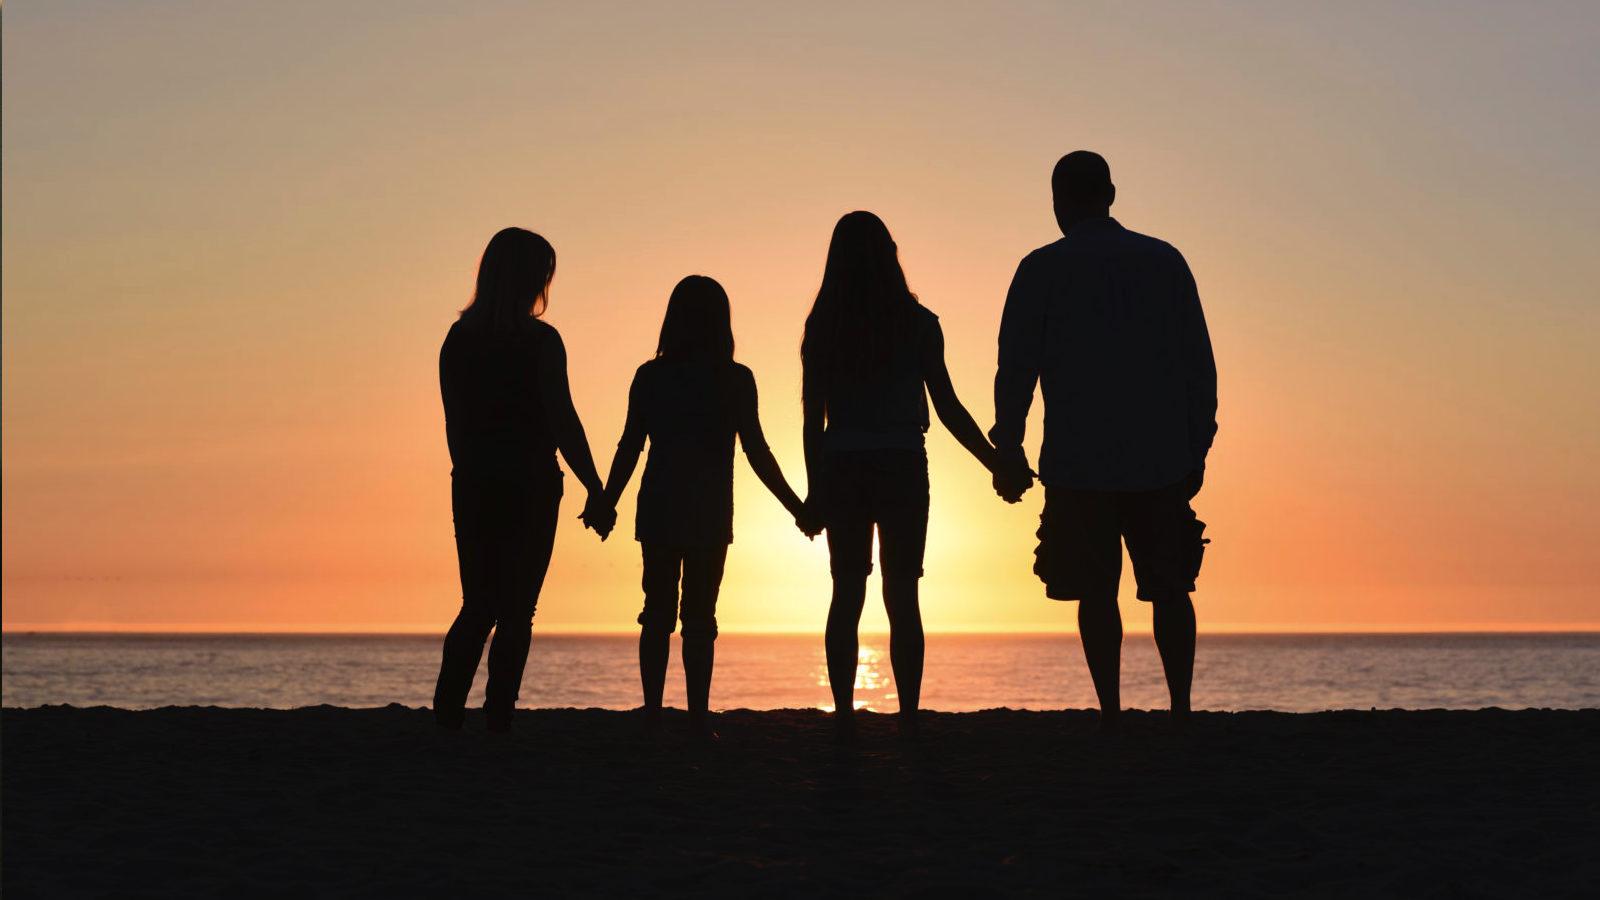 individuals obtain legal immigration status through their relatives